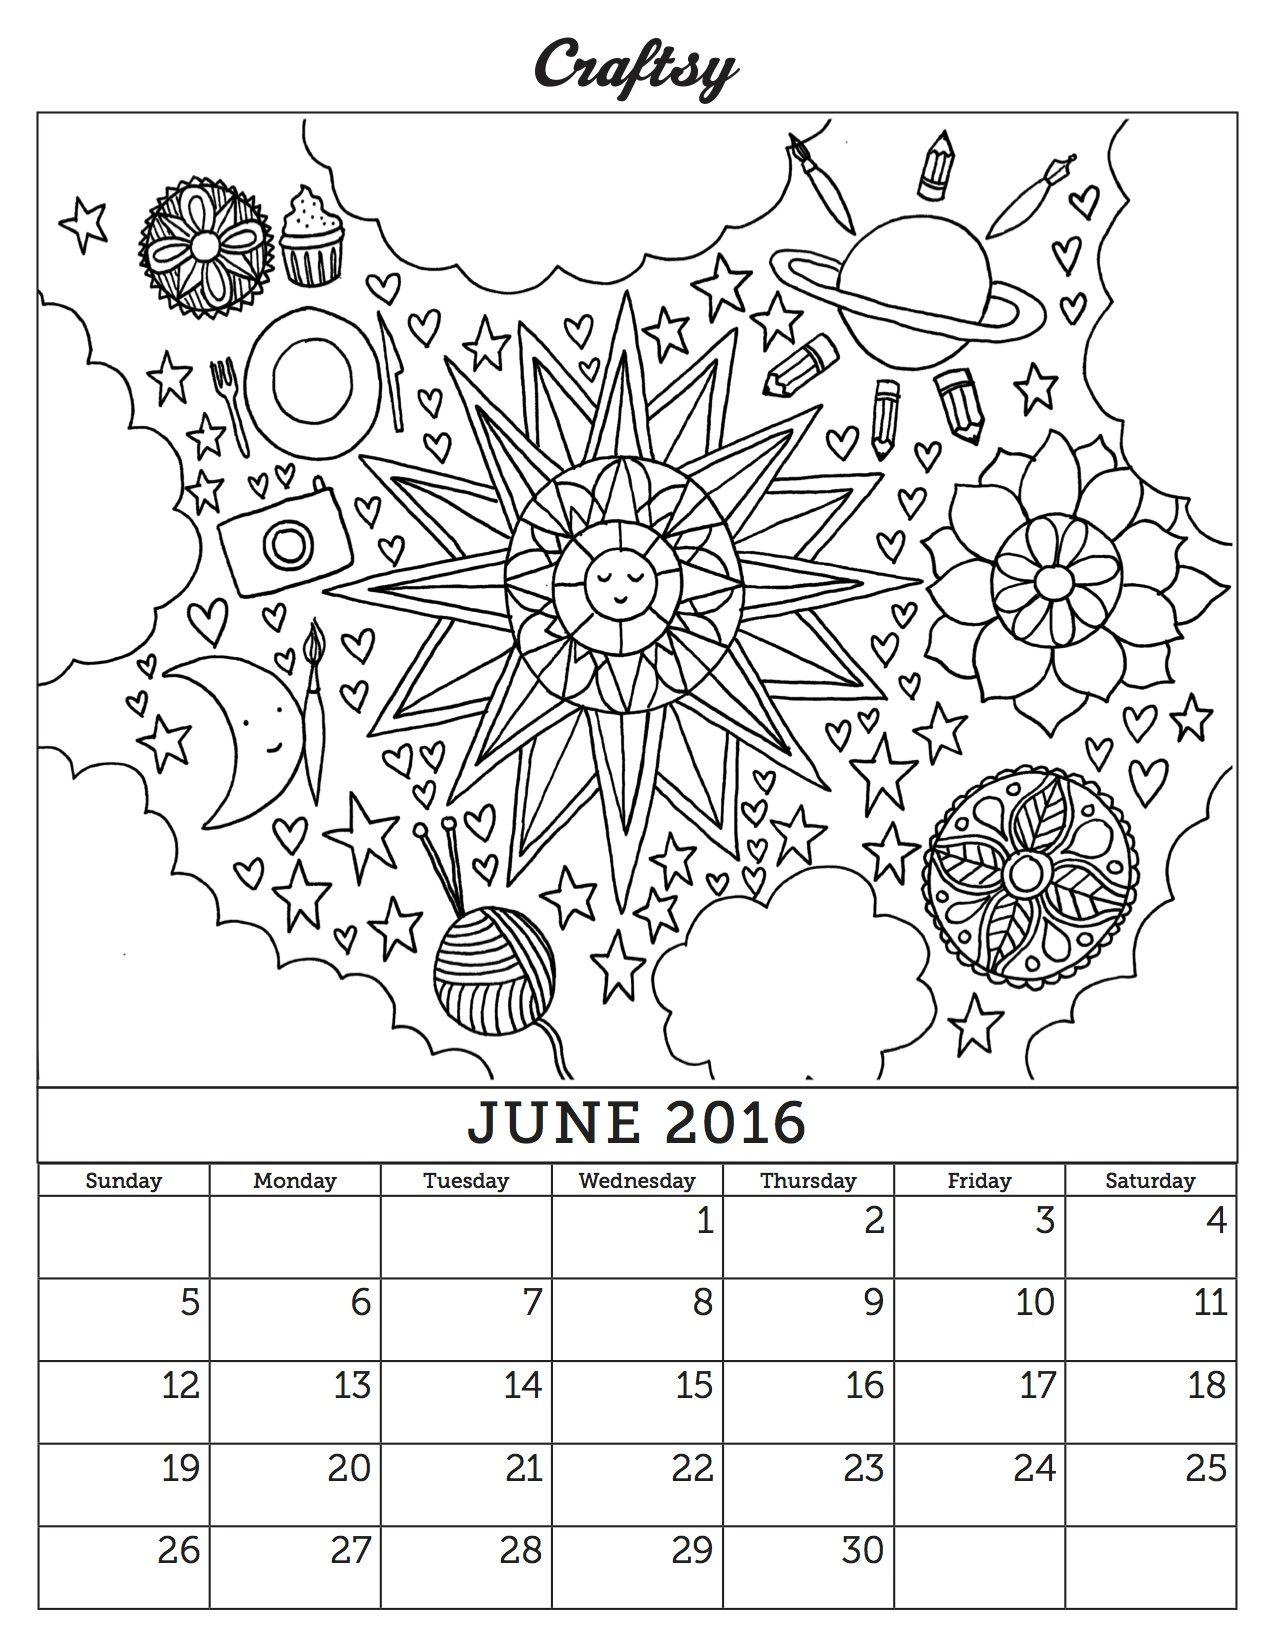 June 2016 Coloring Page Calendar